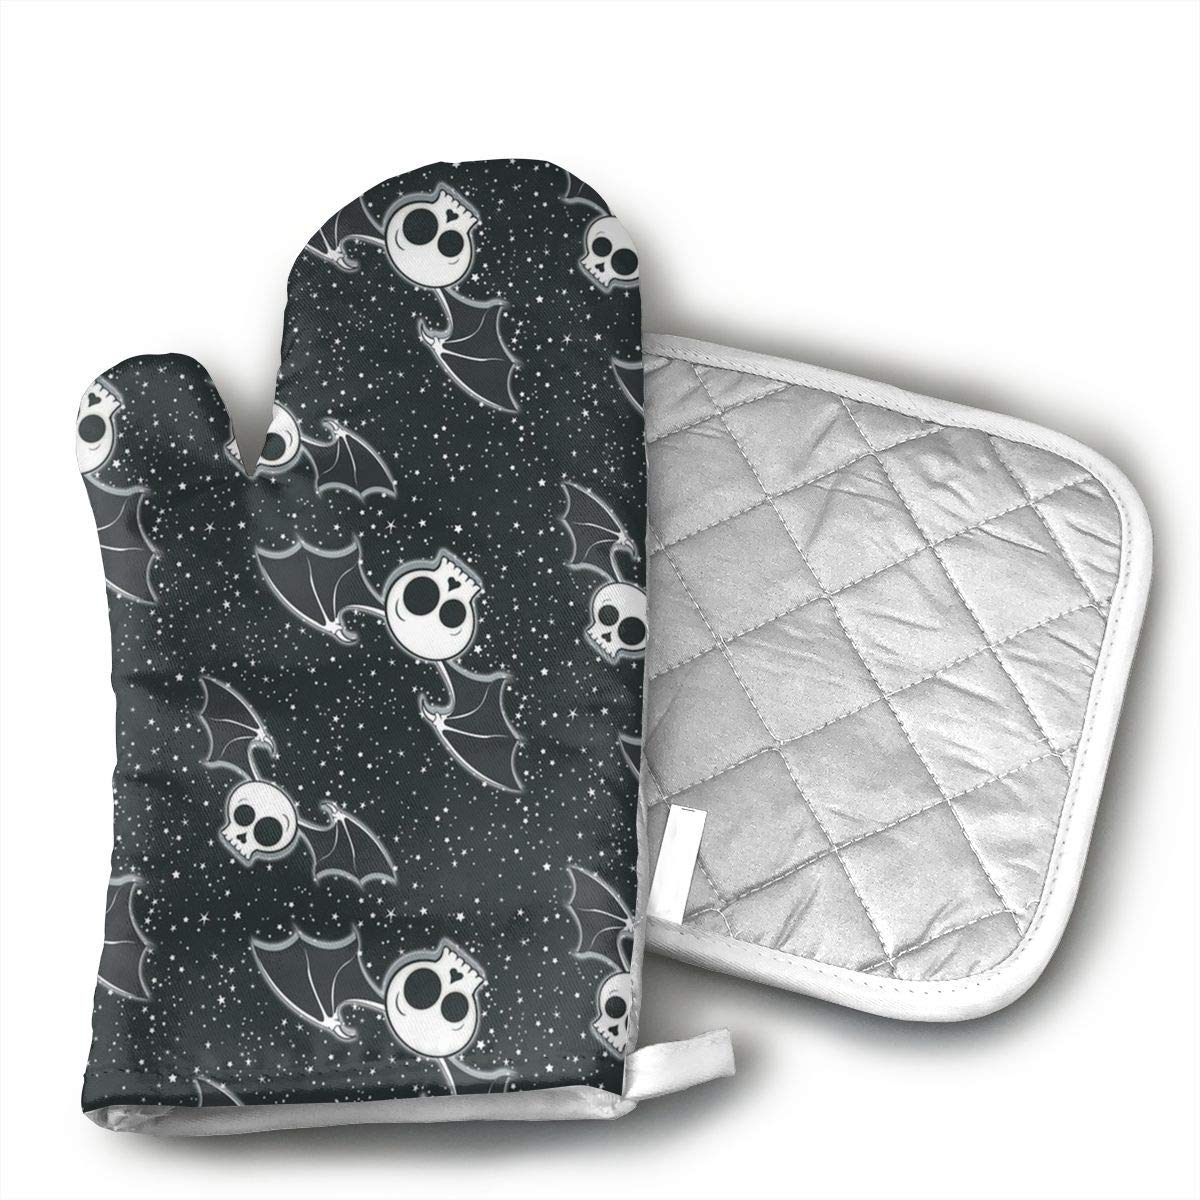 Klnsha7 Halloween Skulls Bat Oven Hot Mitts Professional Heat Resistant Pot Holder & Baking Gloves